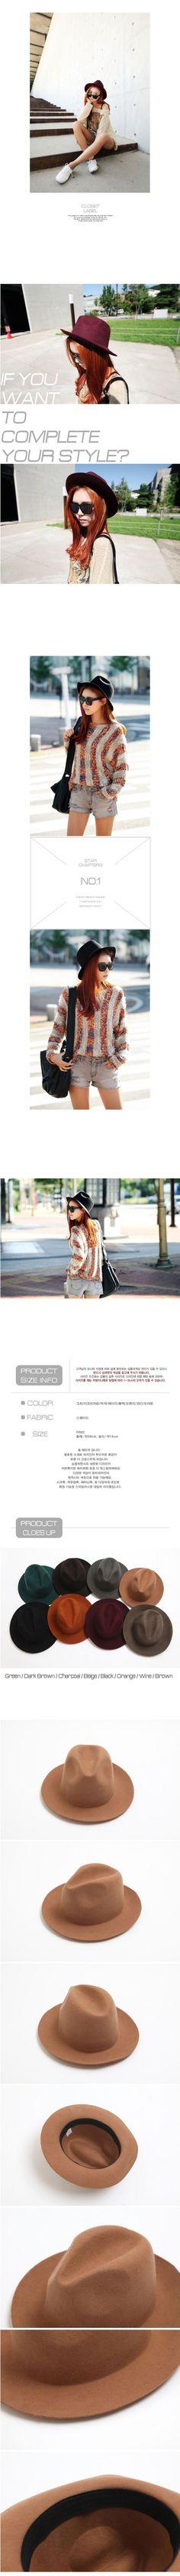 K-Styleme Hats / Caps | Korea Clothing, Asian Style, Korean Accessories